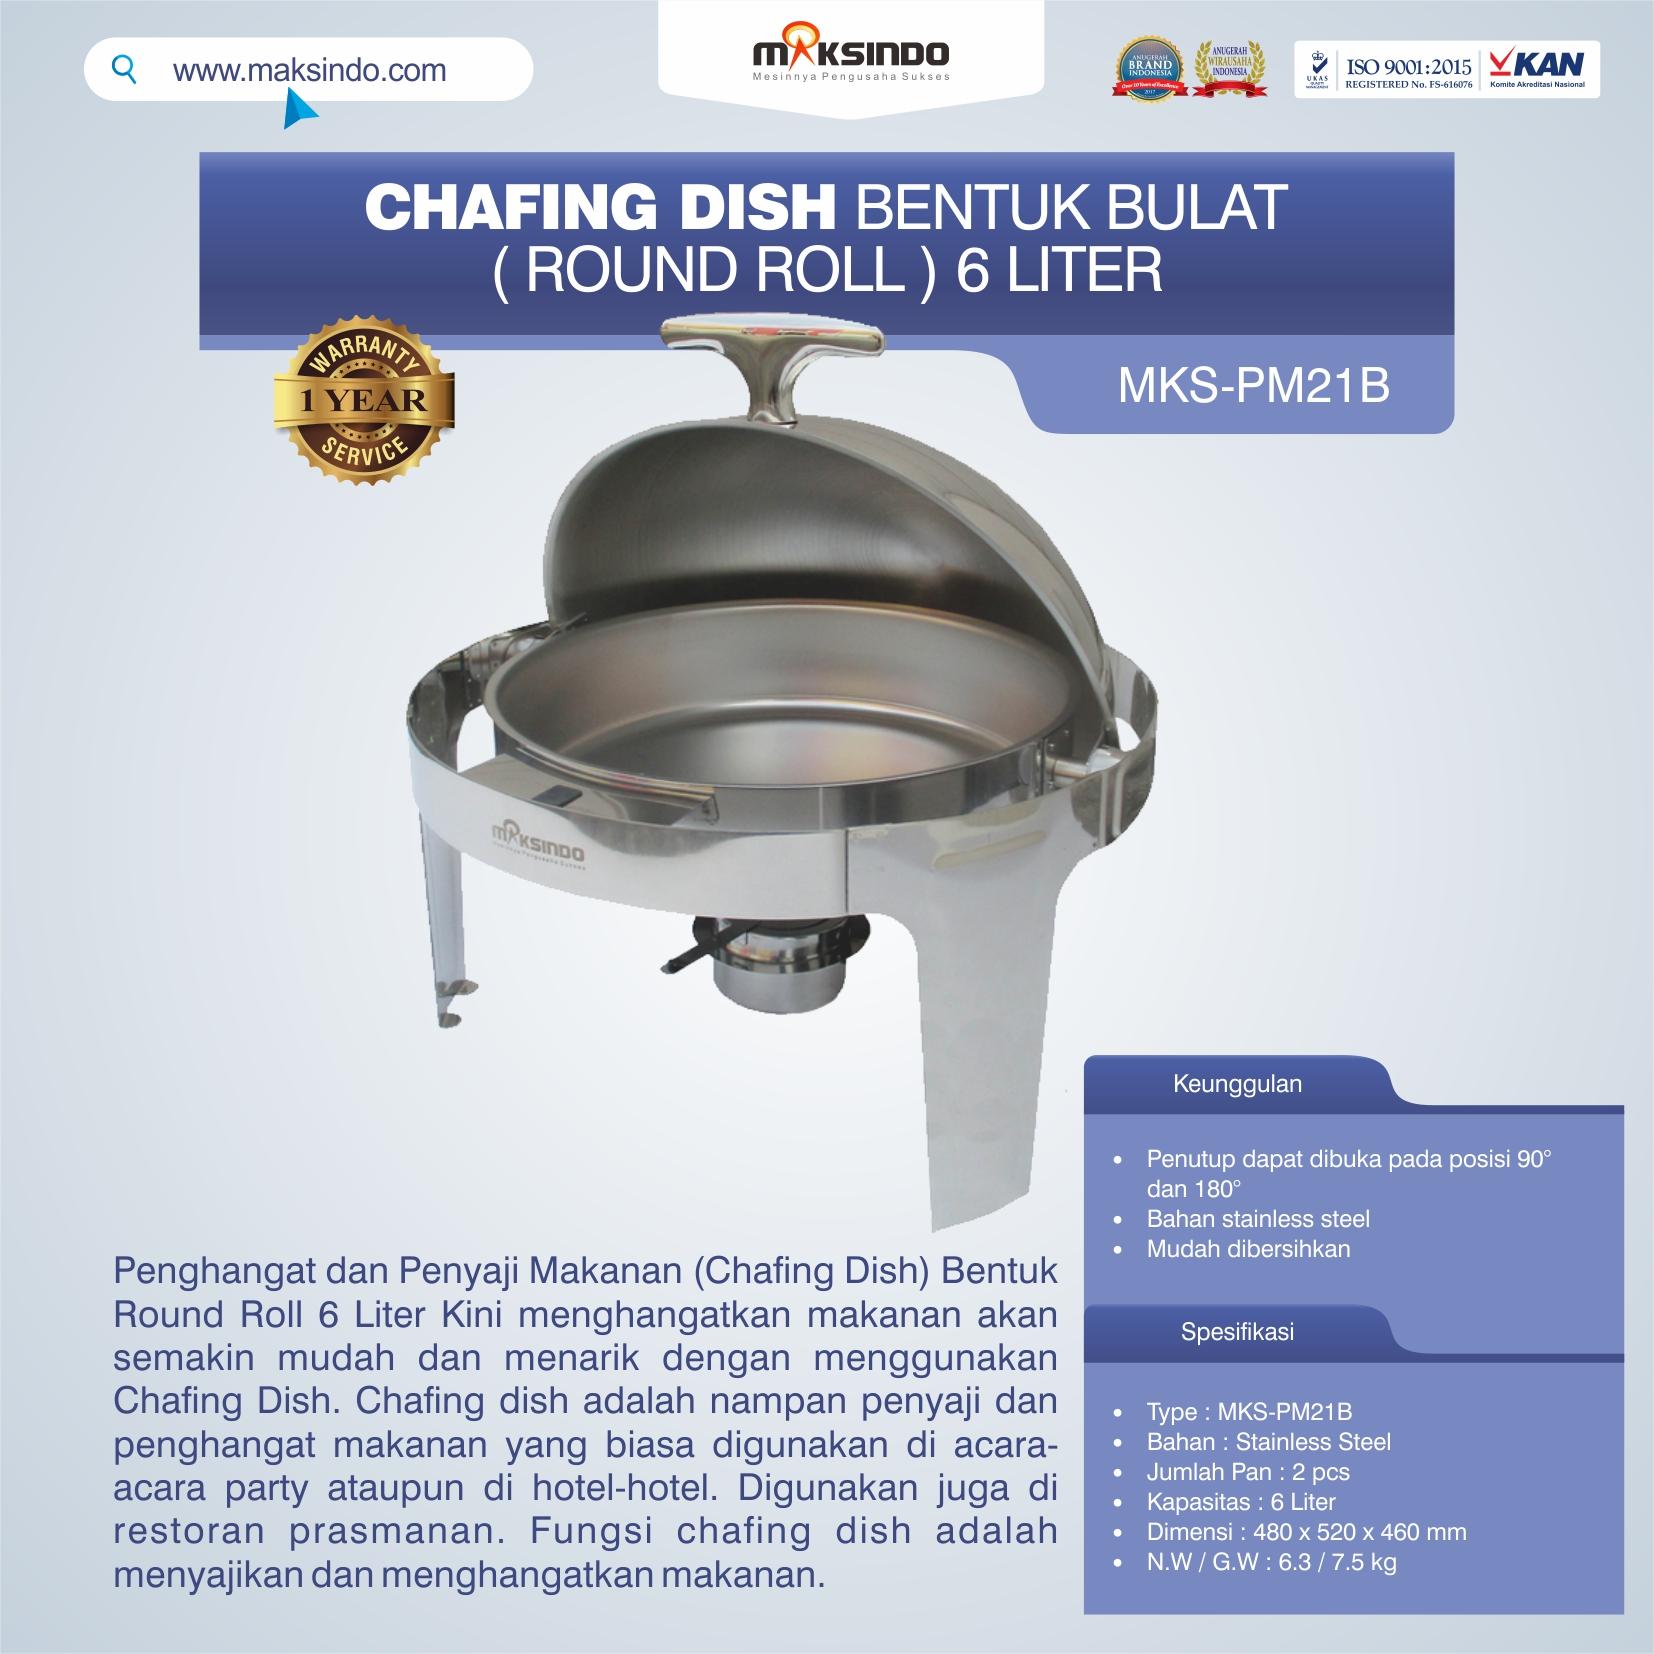 Jual Chafing Dish Bentuk Bulat (Round Roll) 6 Liter di Bali